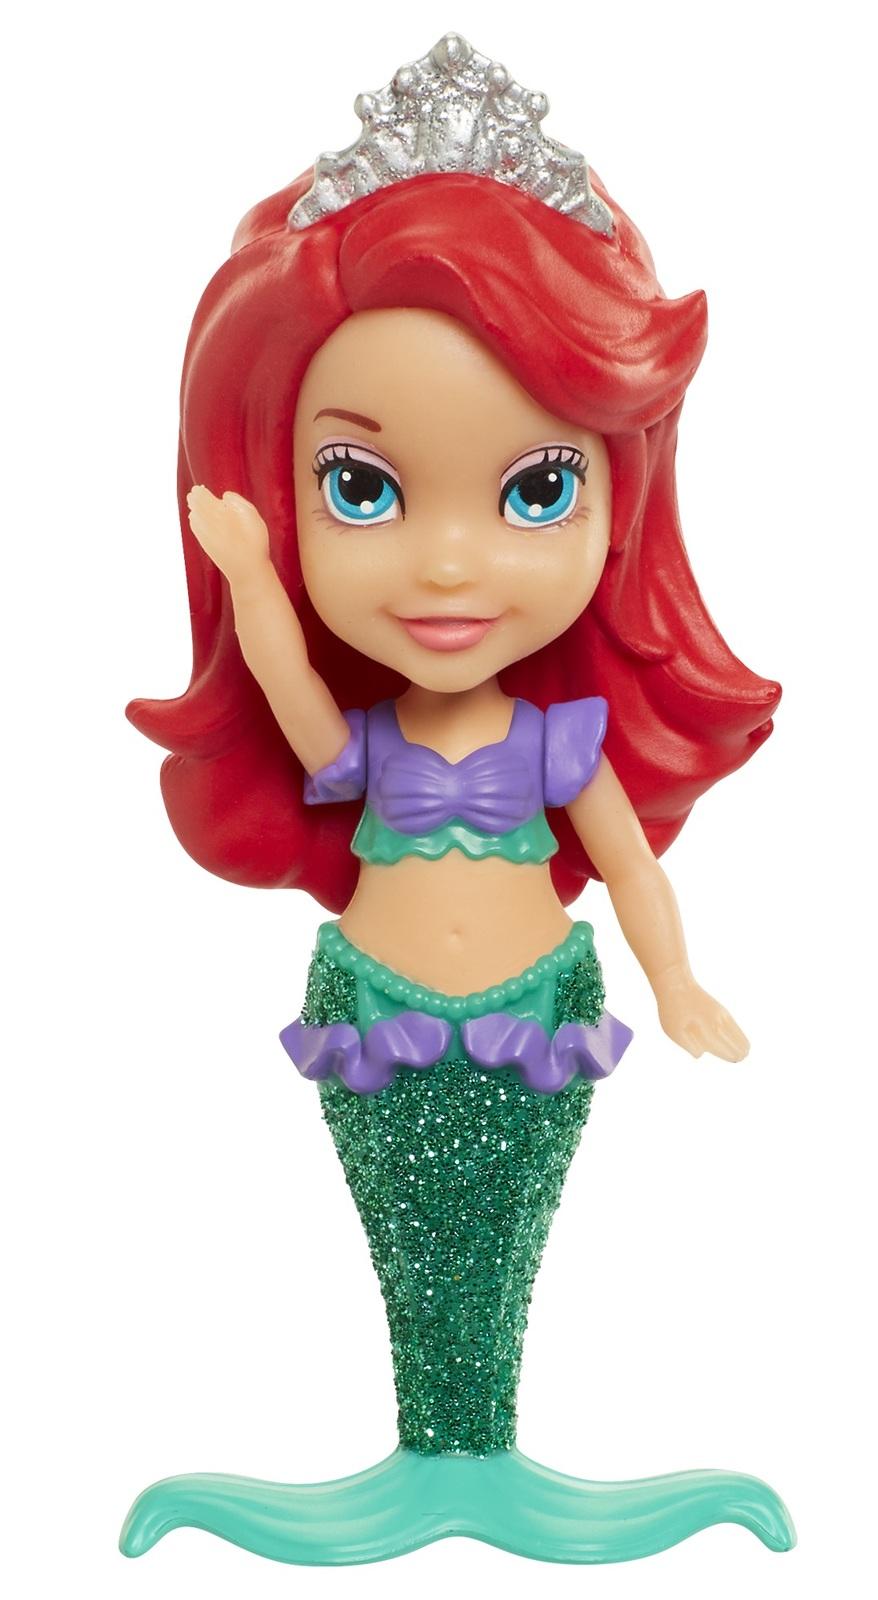 7707f427190 ... Disney Princess  My First Mini Toddler Doll - Ariel (Mermaid) image